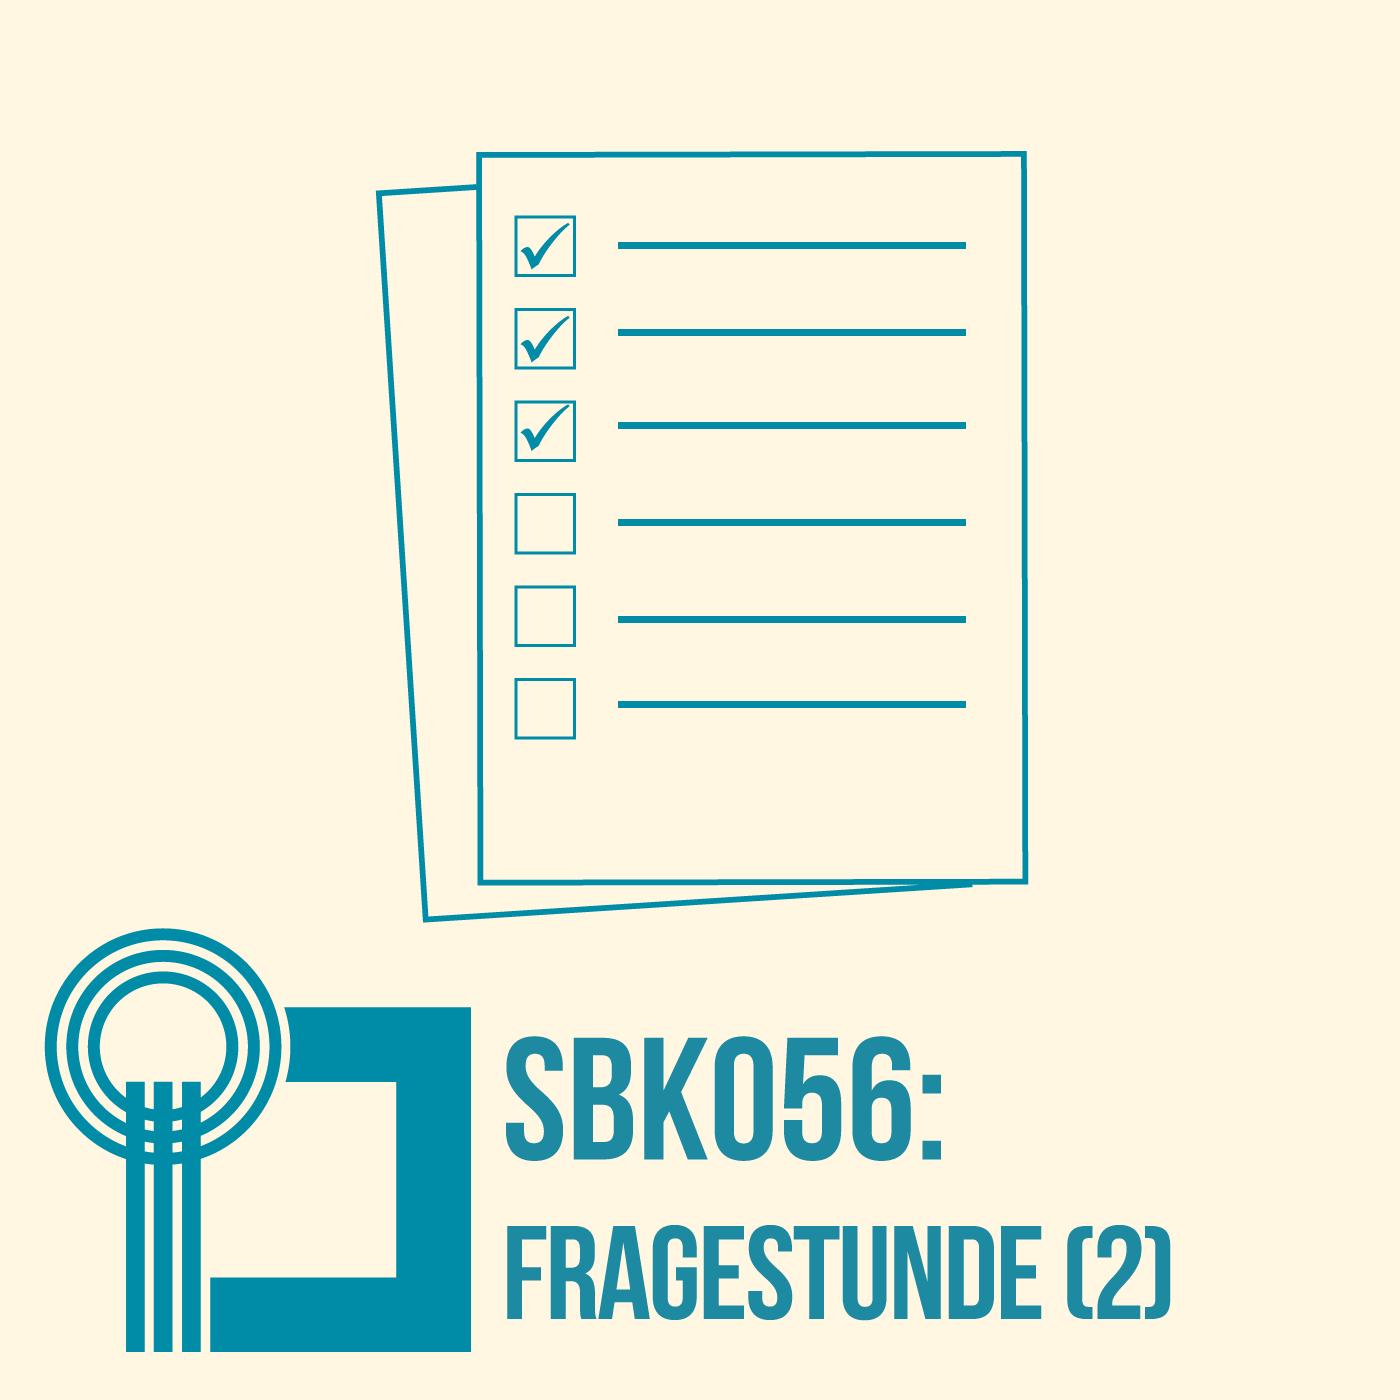 SBK056 Fragestunde (2)